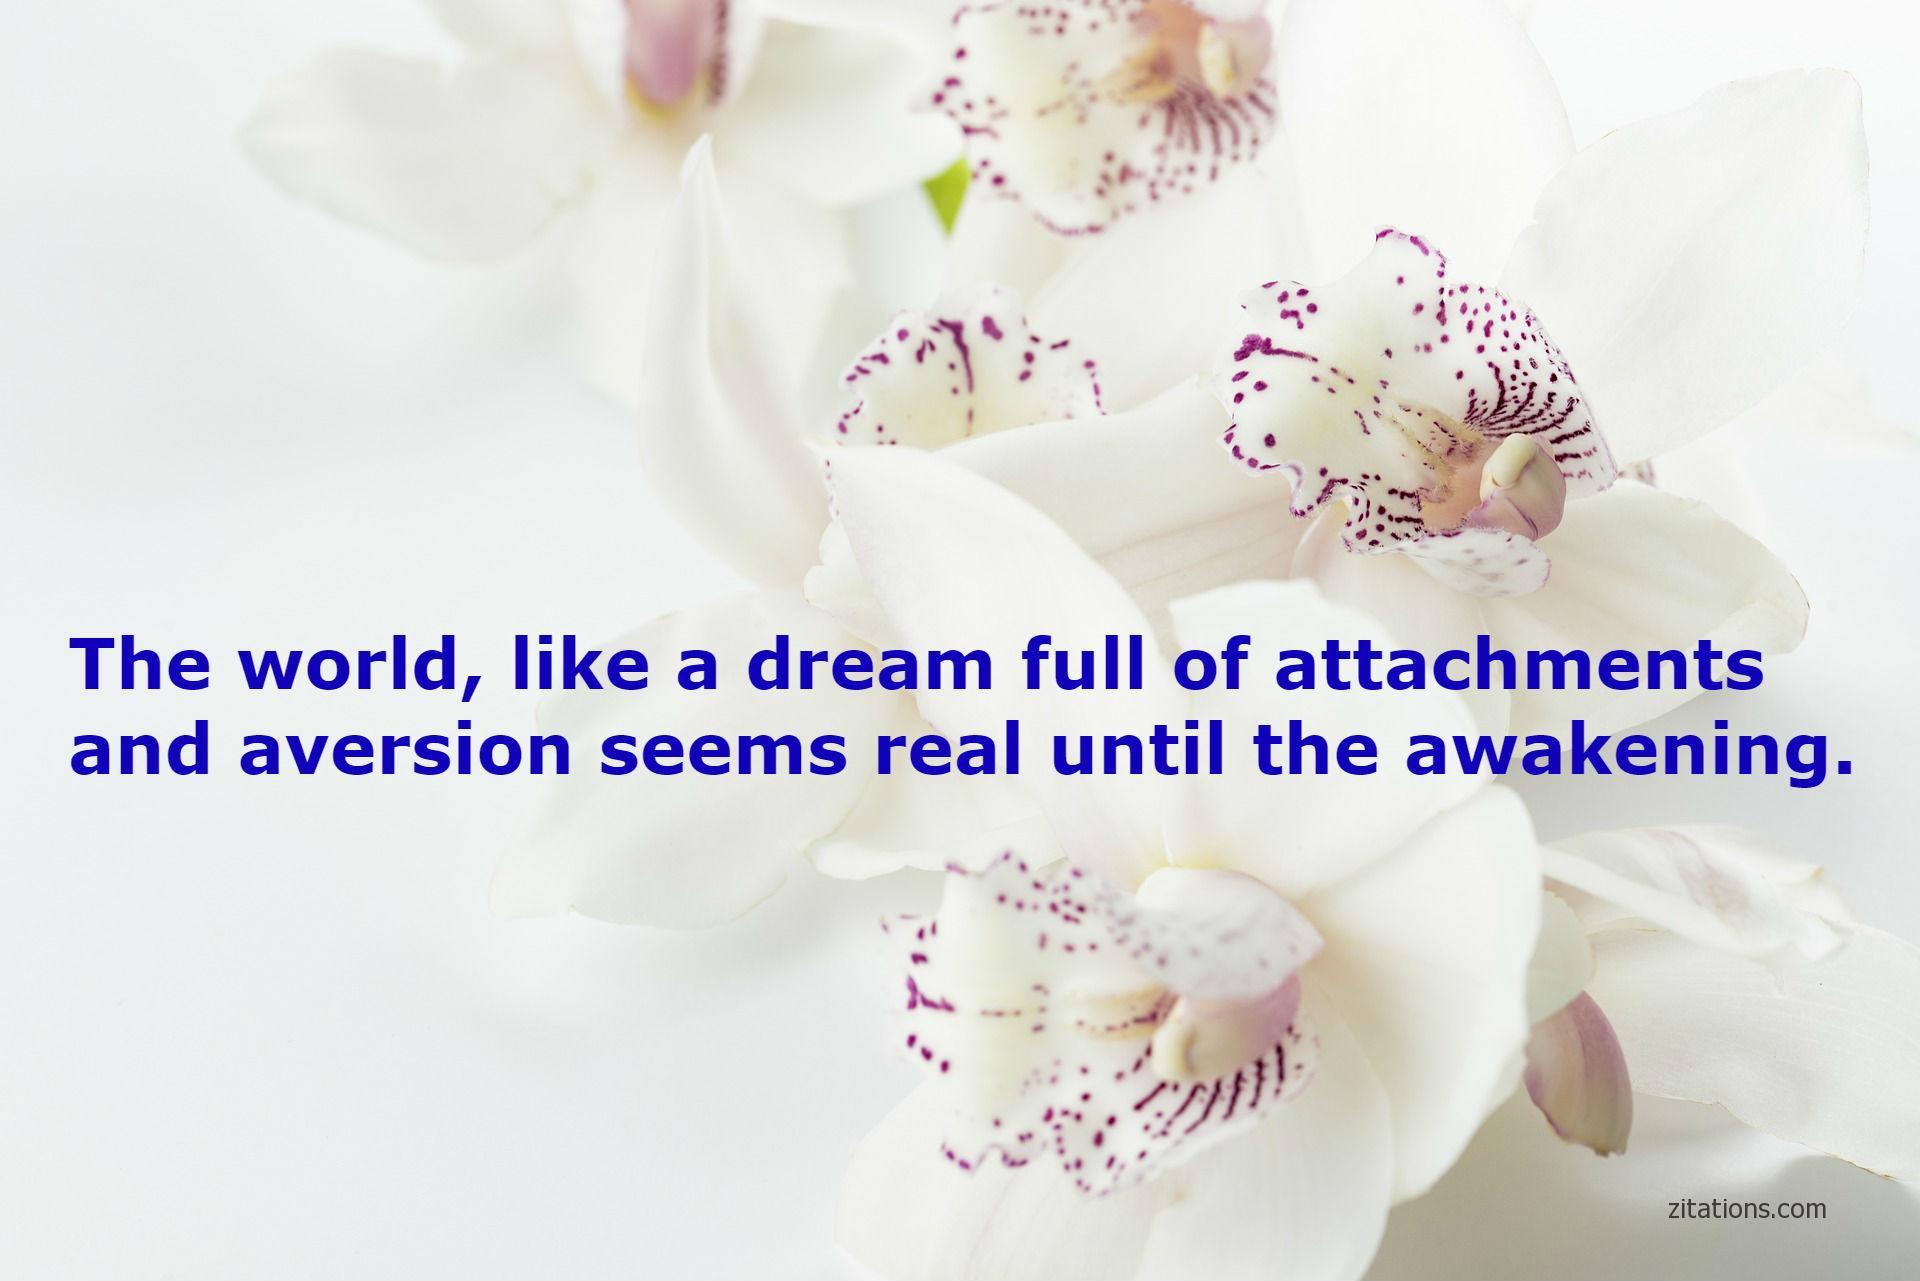 quotes of shankaracharya